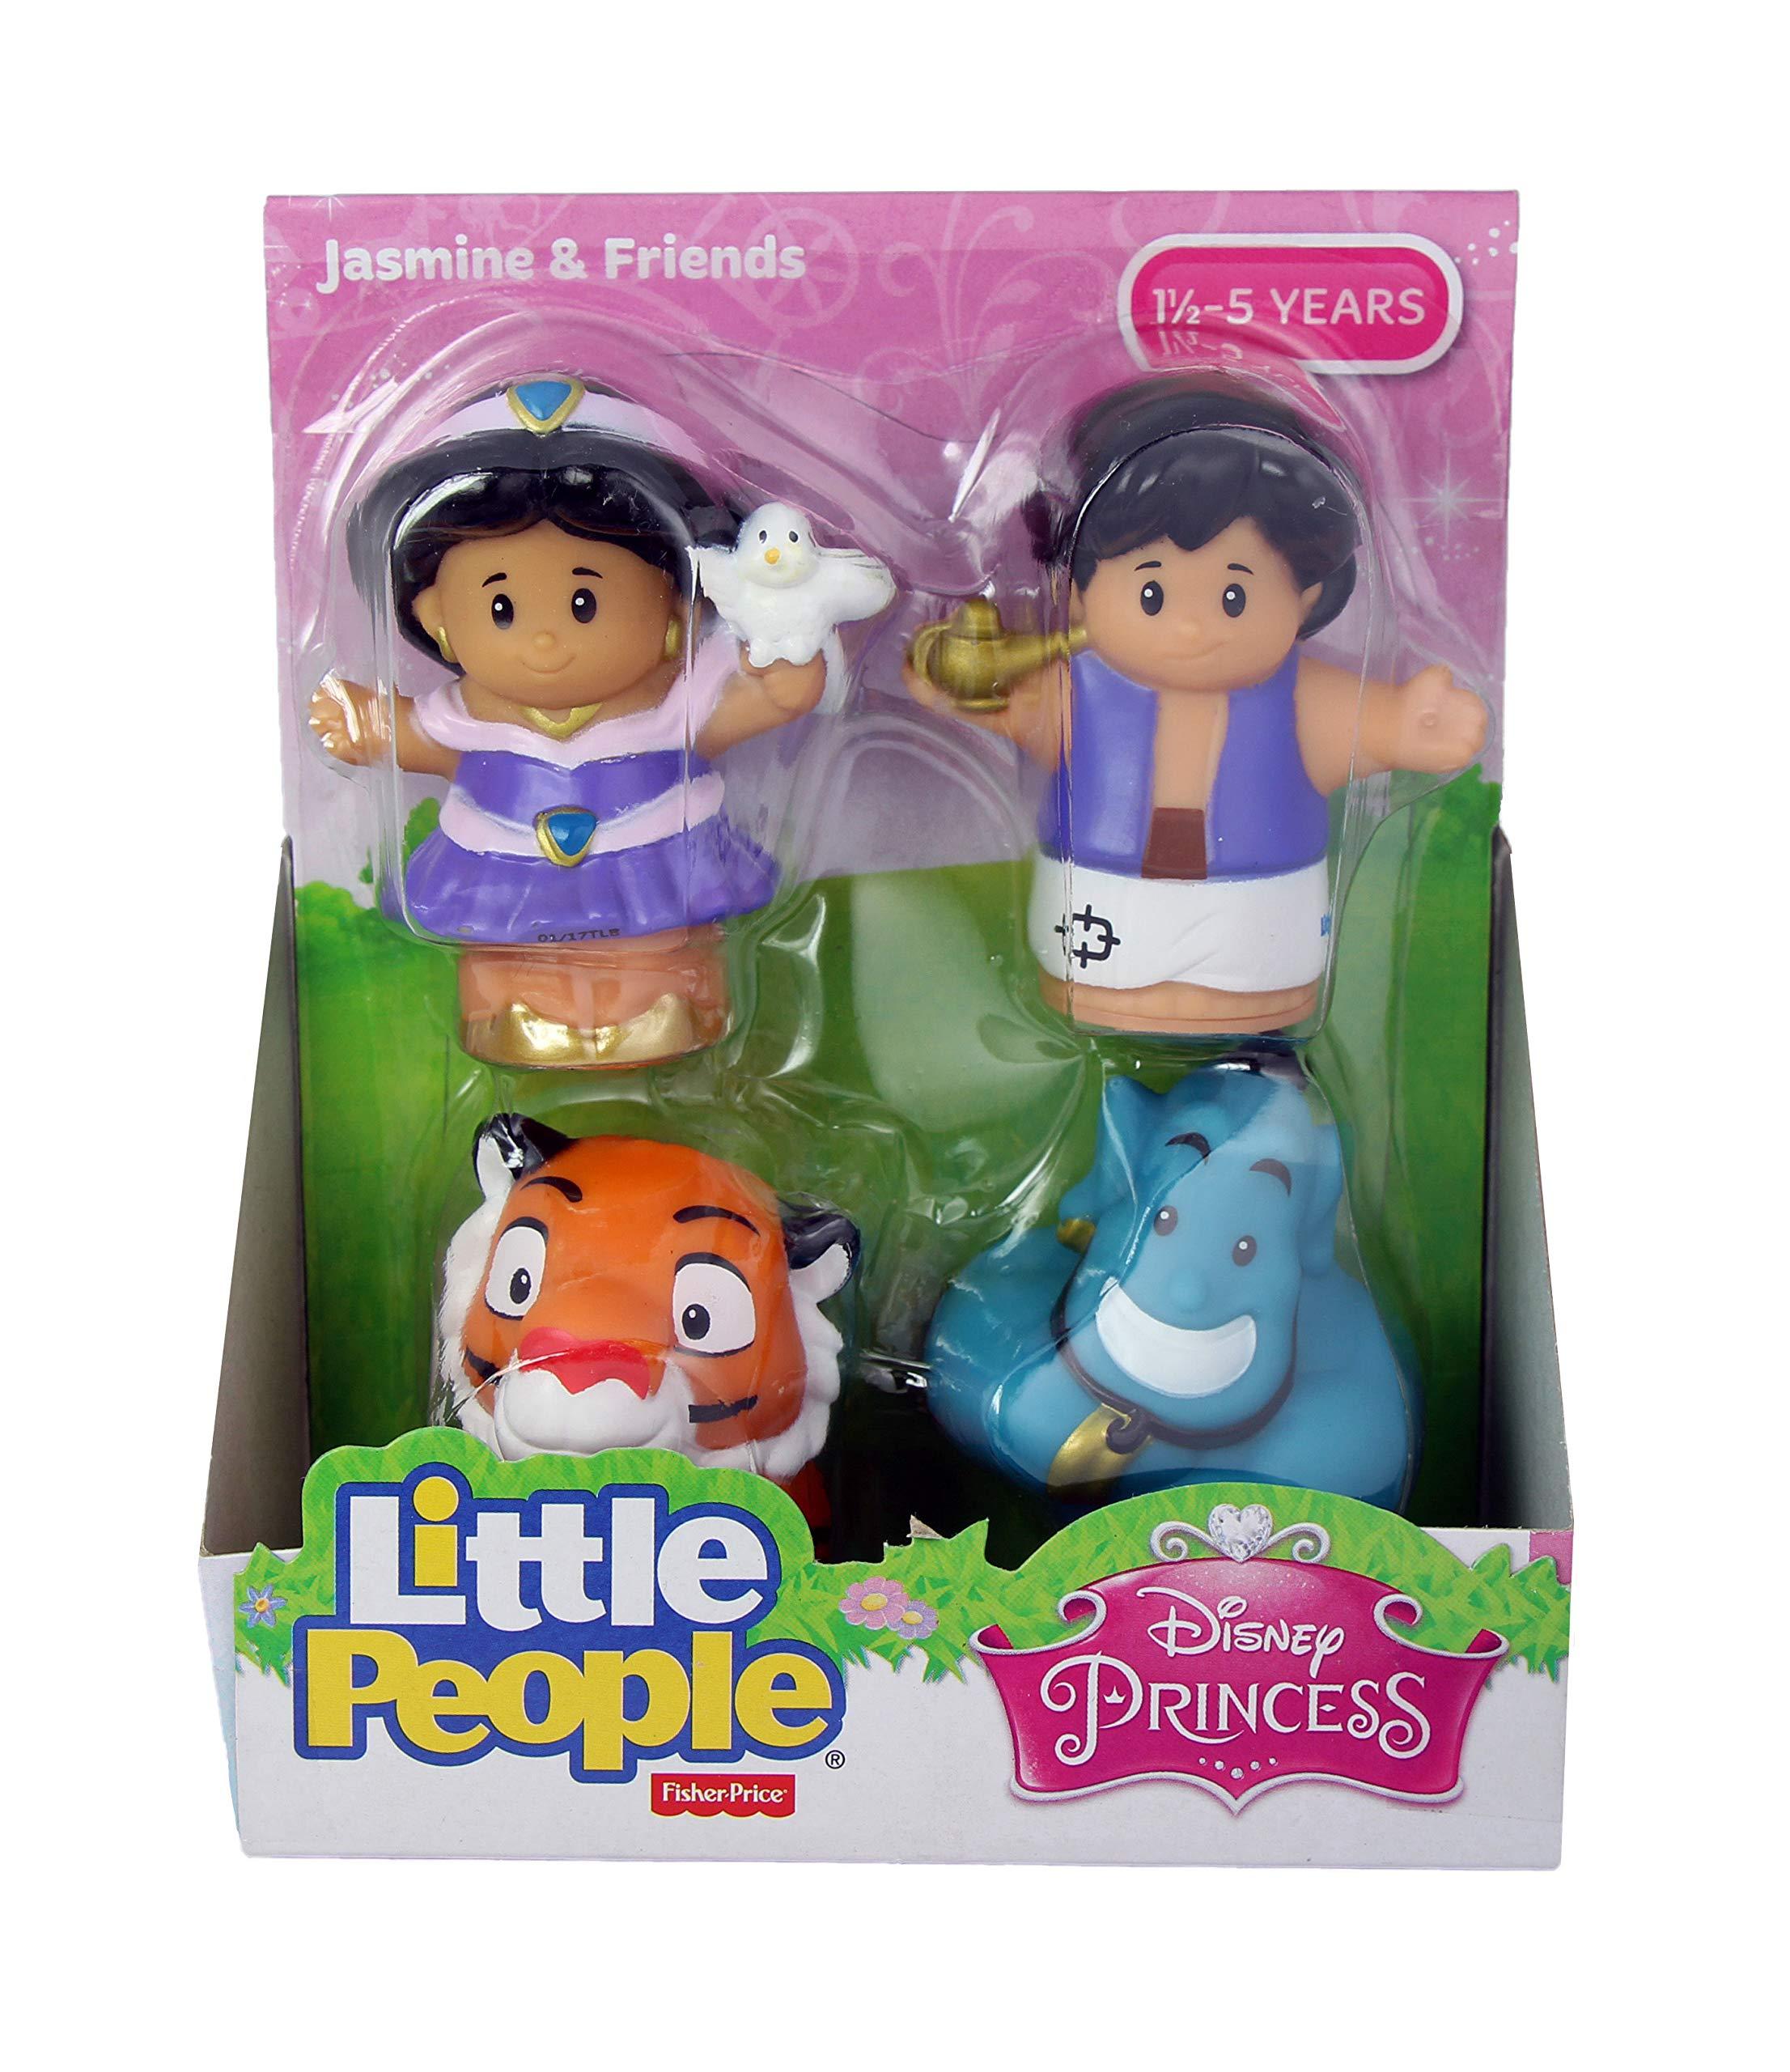 Fisher Price Little People Disney Princess & Friends Figure Set of 4 - Belle, Cinderella, Jasmin & Rapunzel by Disney Princess (Image #6)